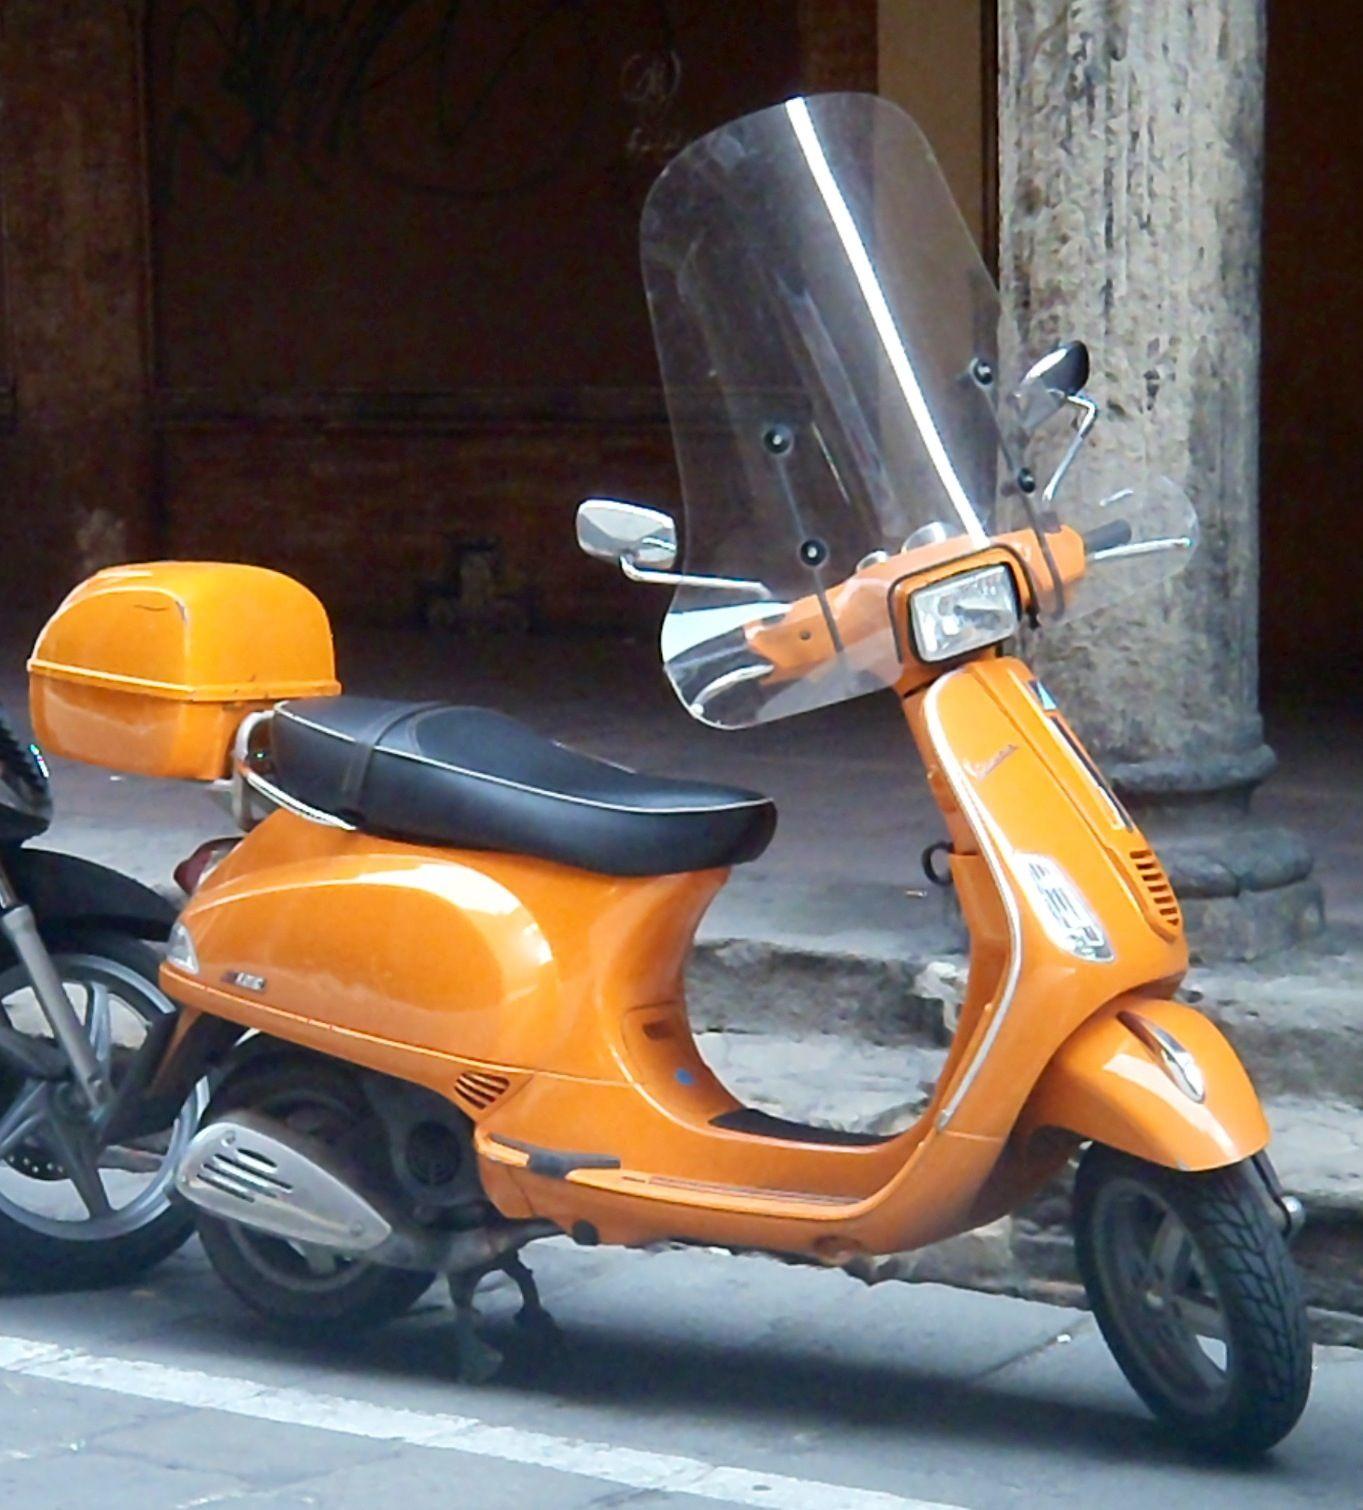 Orange motorcycle (Bologna, Italy)